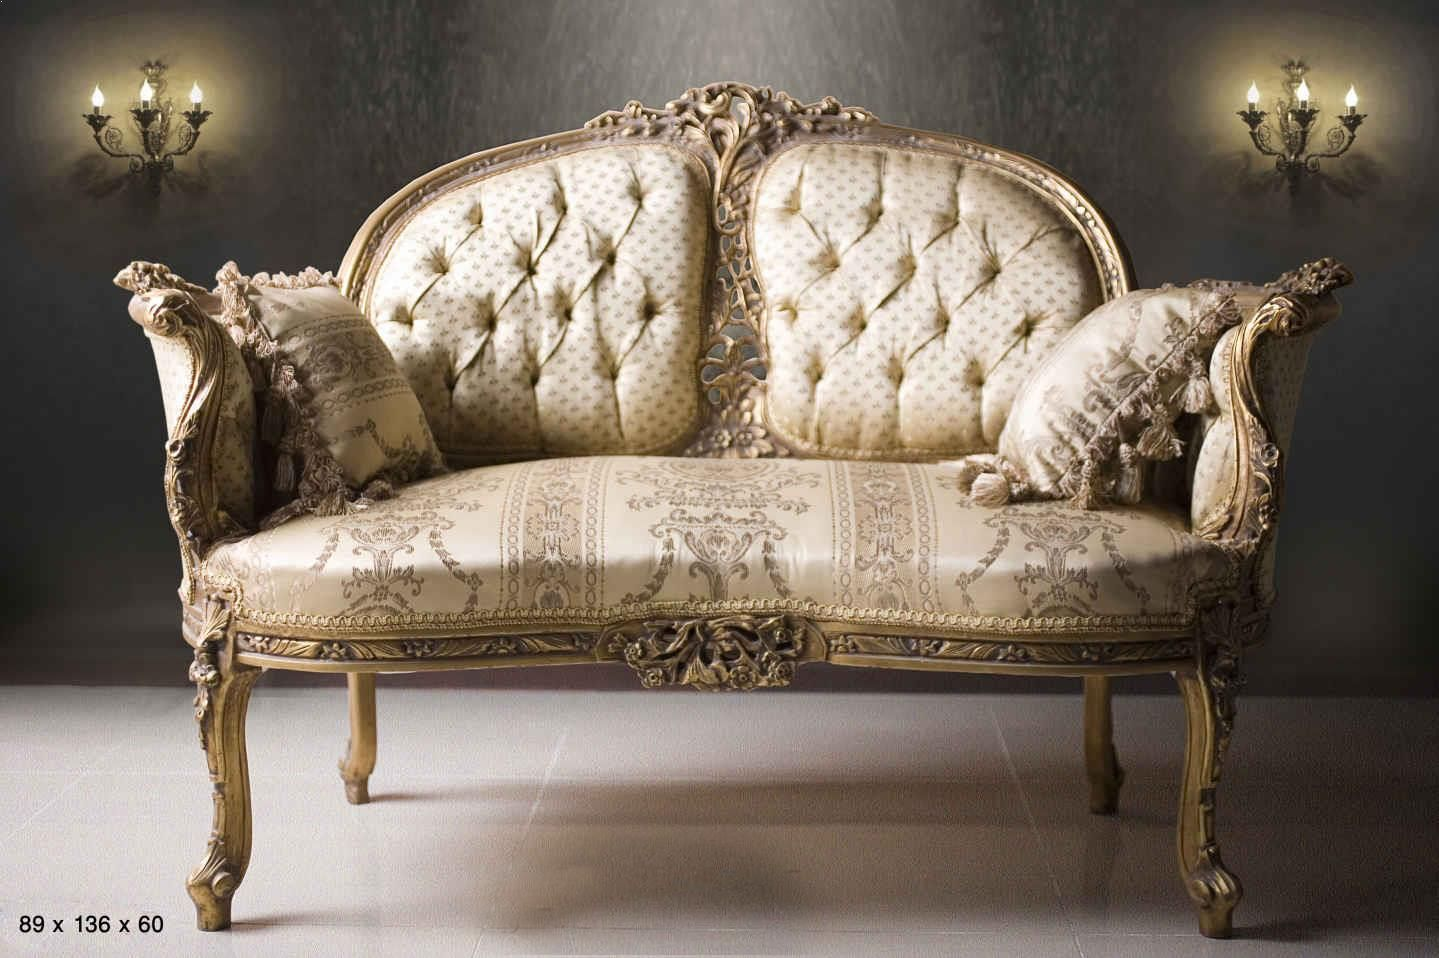 afbeeldingsresultaat voor louis xv sofa furniture diy. Black Bedroom Furniture Sets. Home Design Ideas